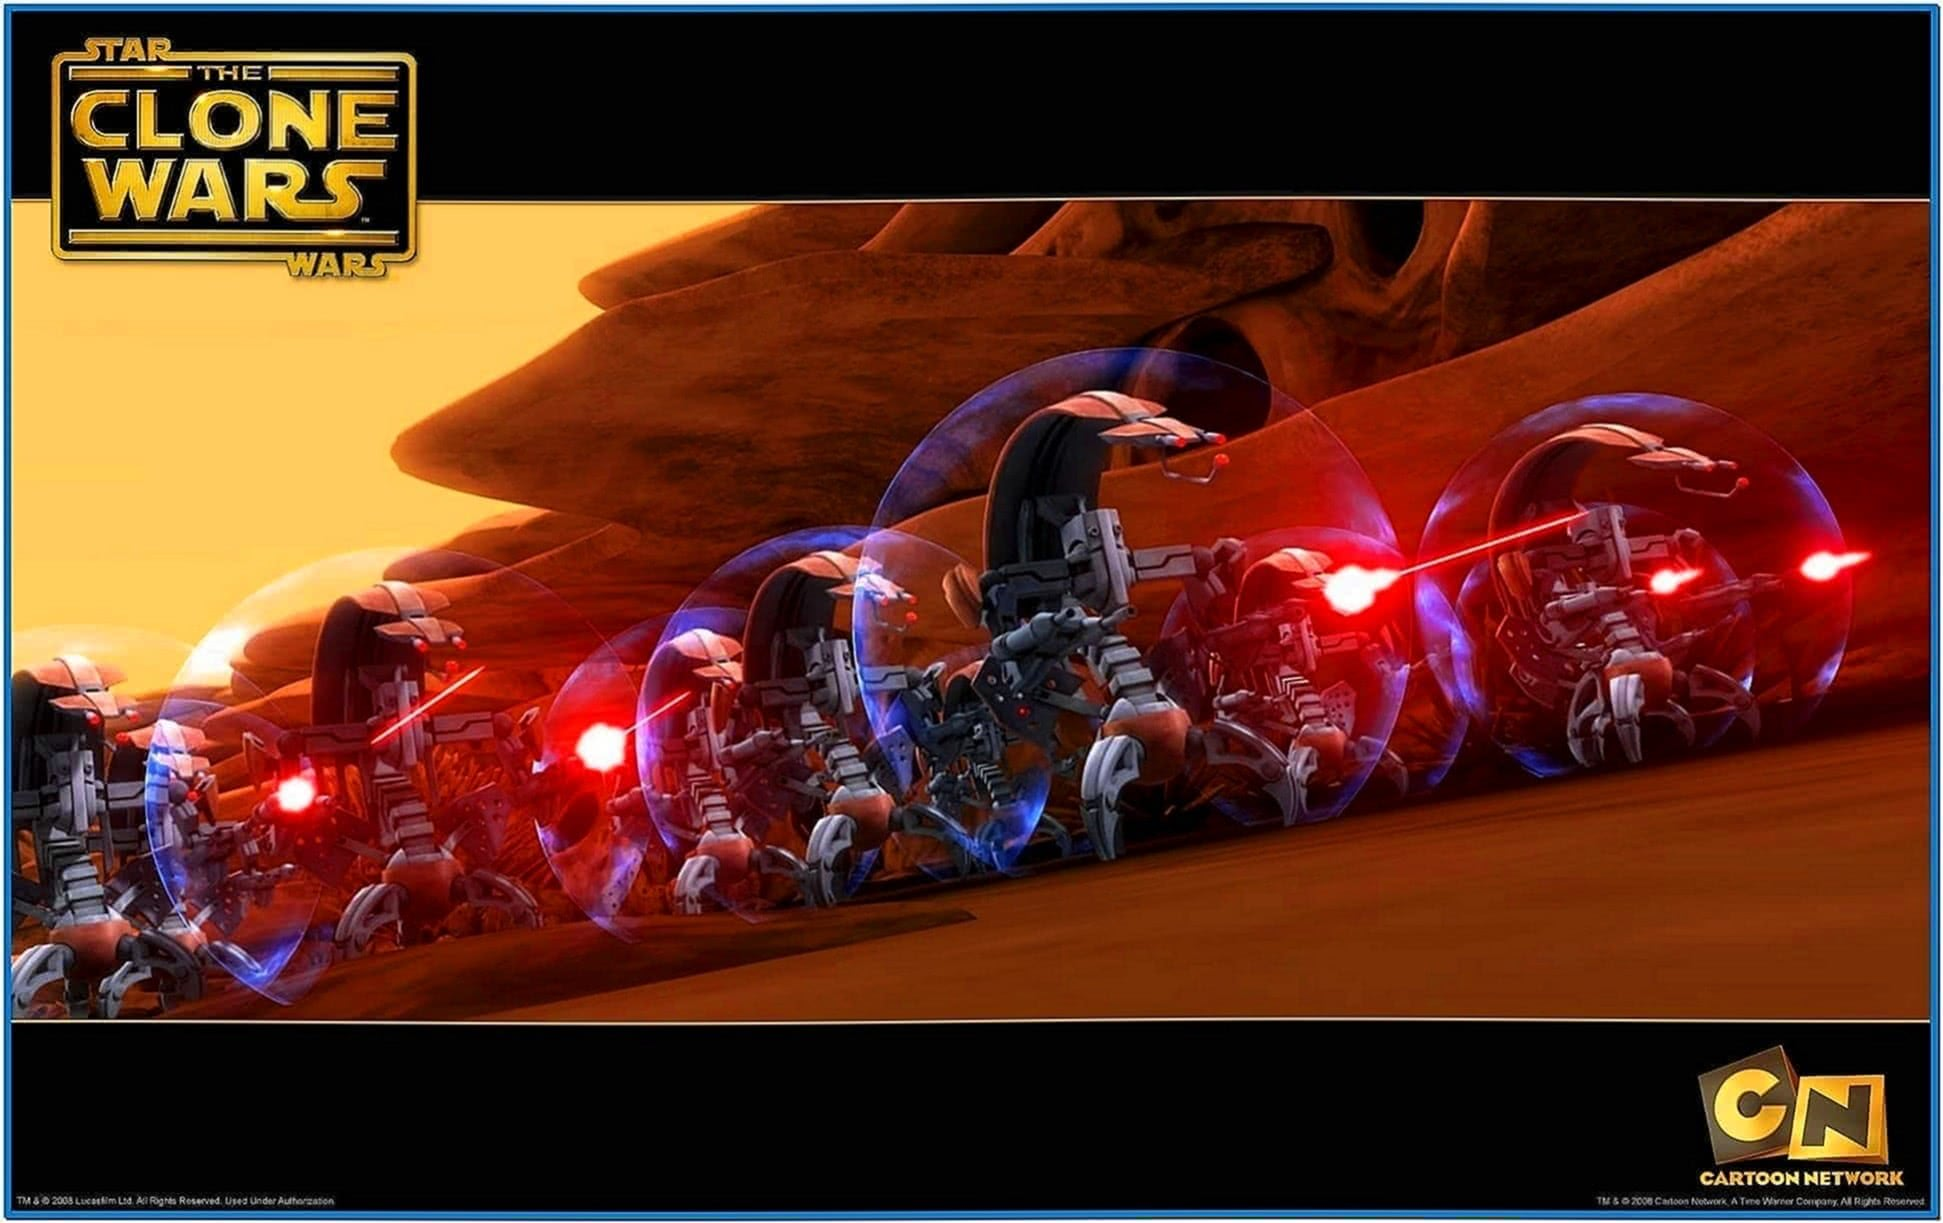 Star Wars The Clone Wars Screensaver